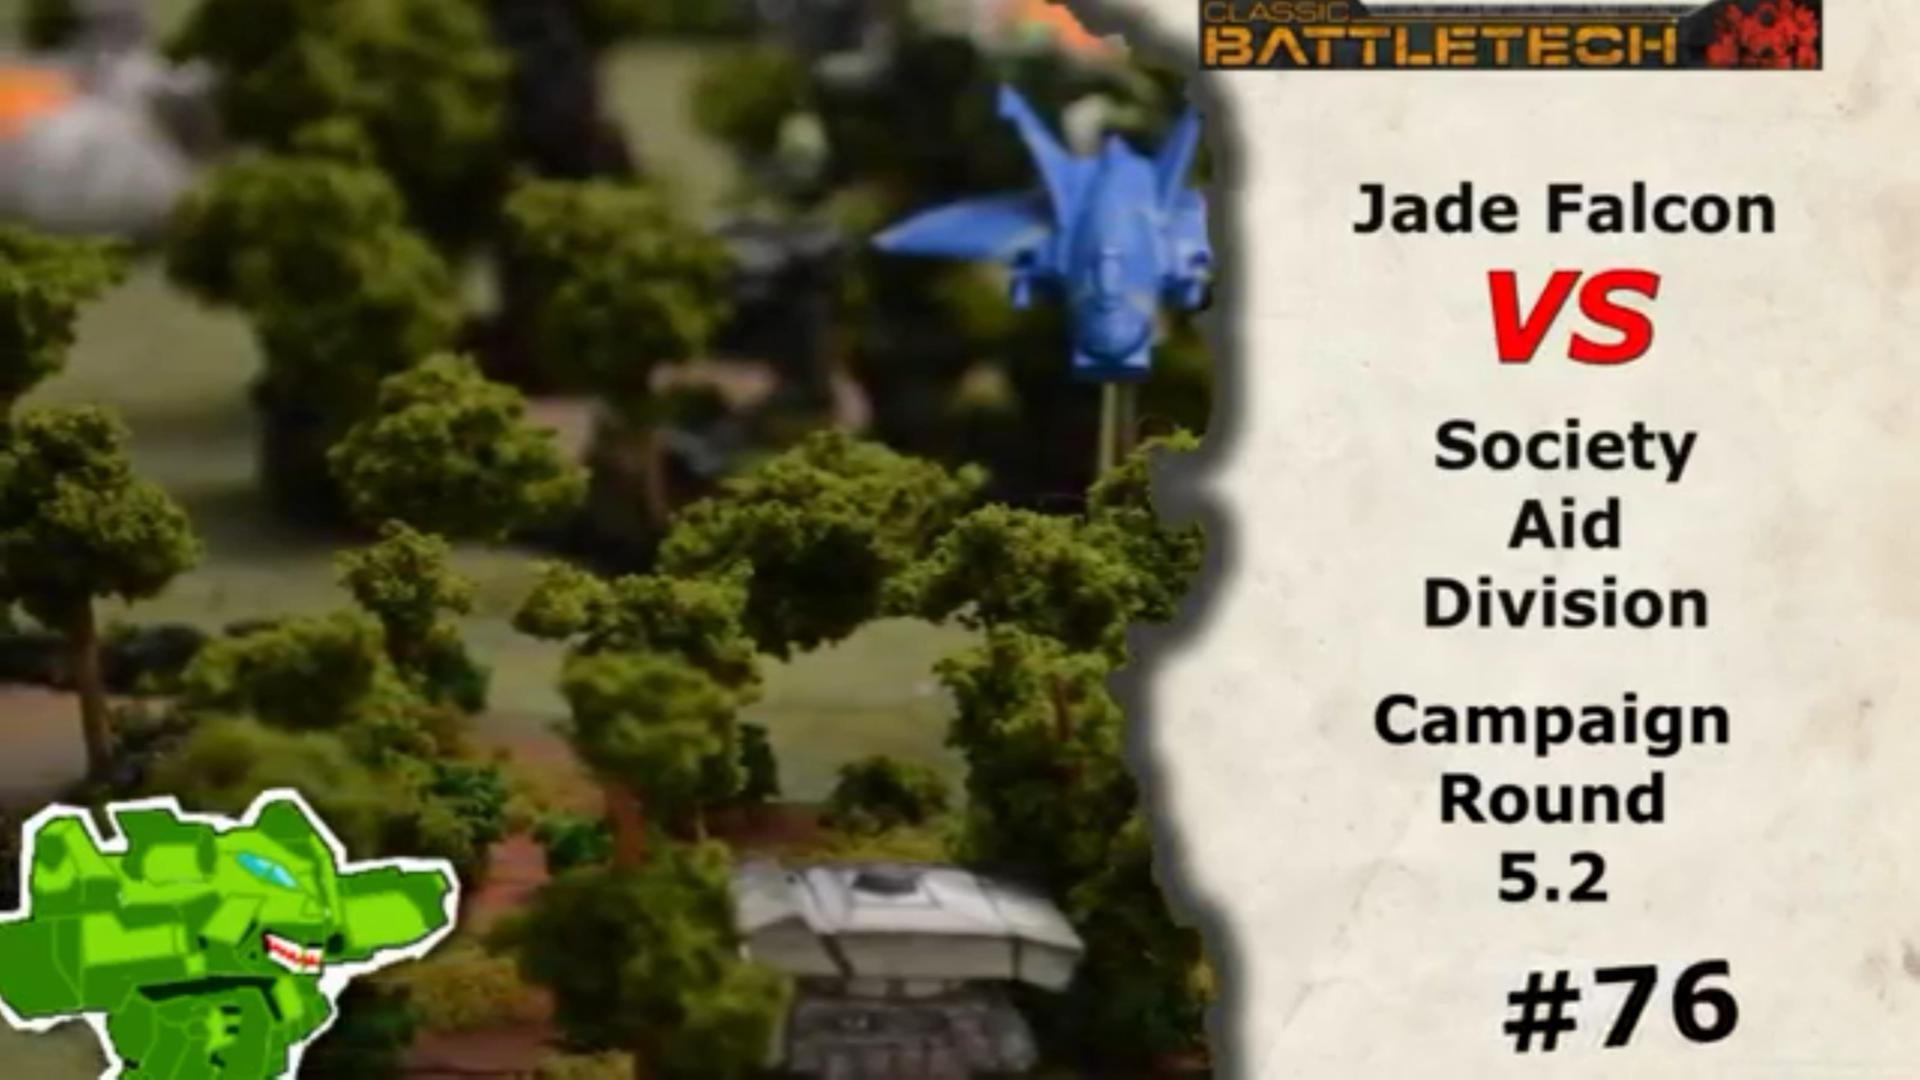 #76 Jade Falcon vs Society Aid Division